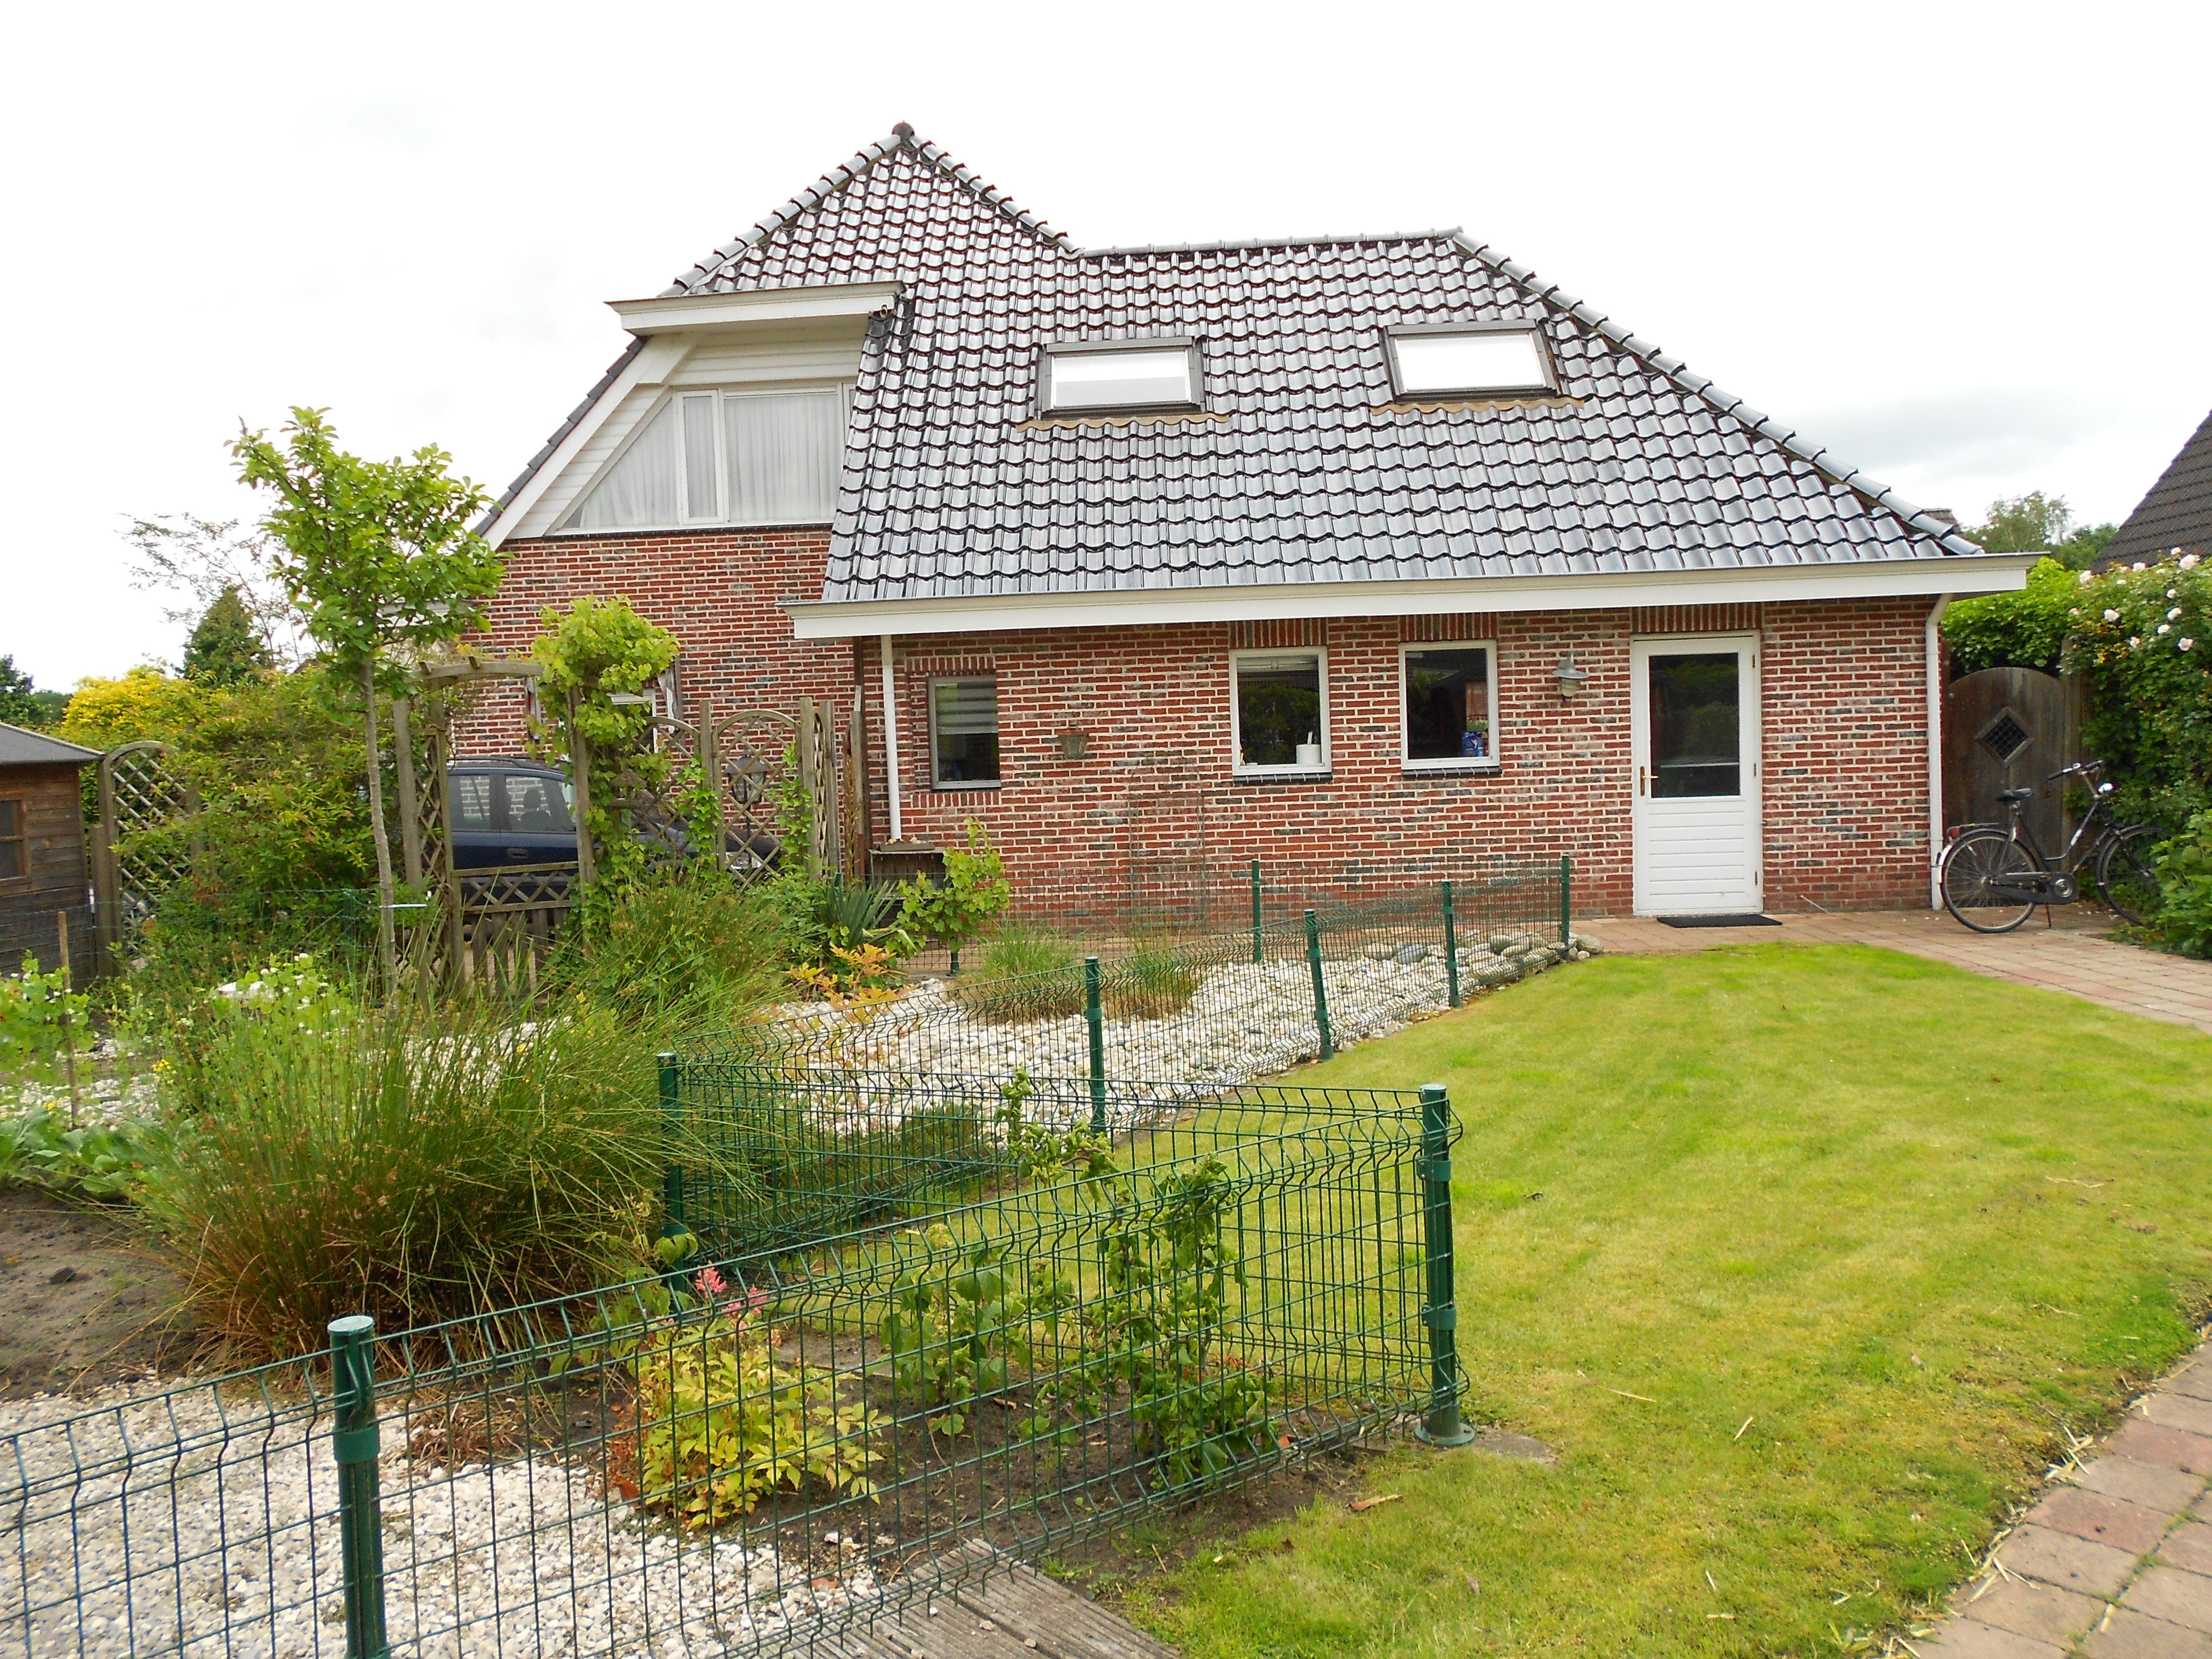 vrijstaande woning circa 800 vierkante m. grond, nieuweroord : Bokt.nl